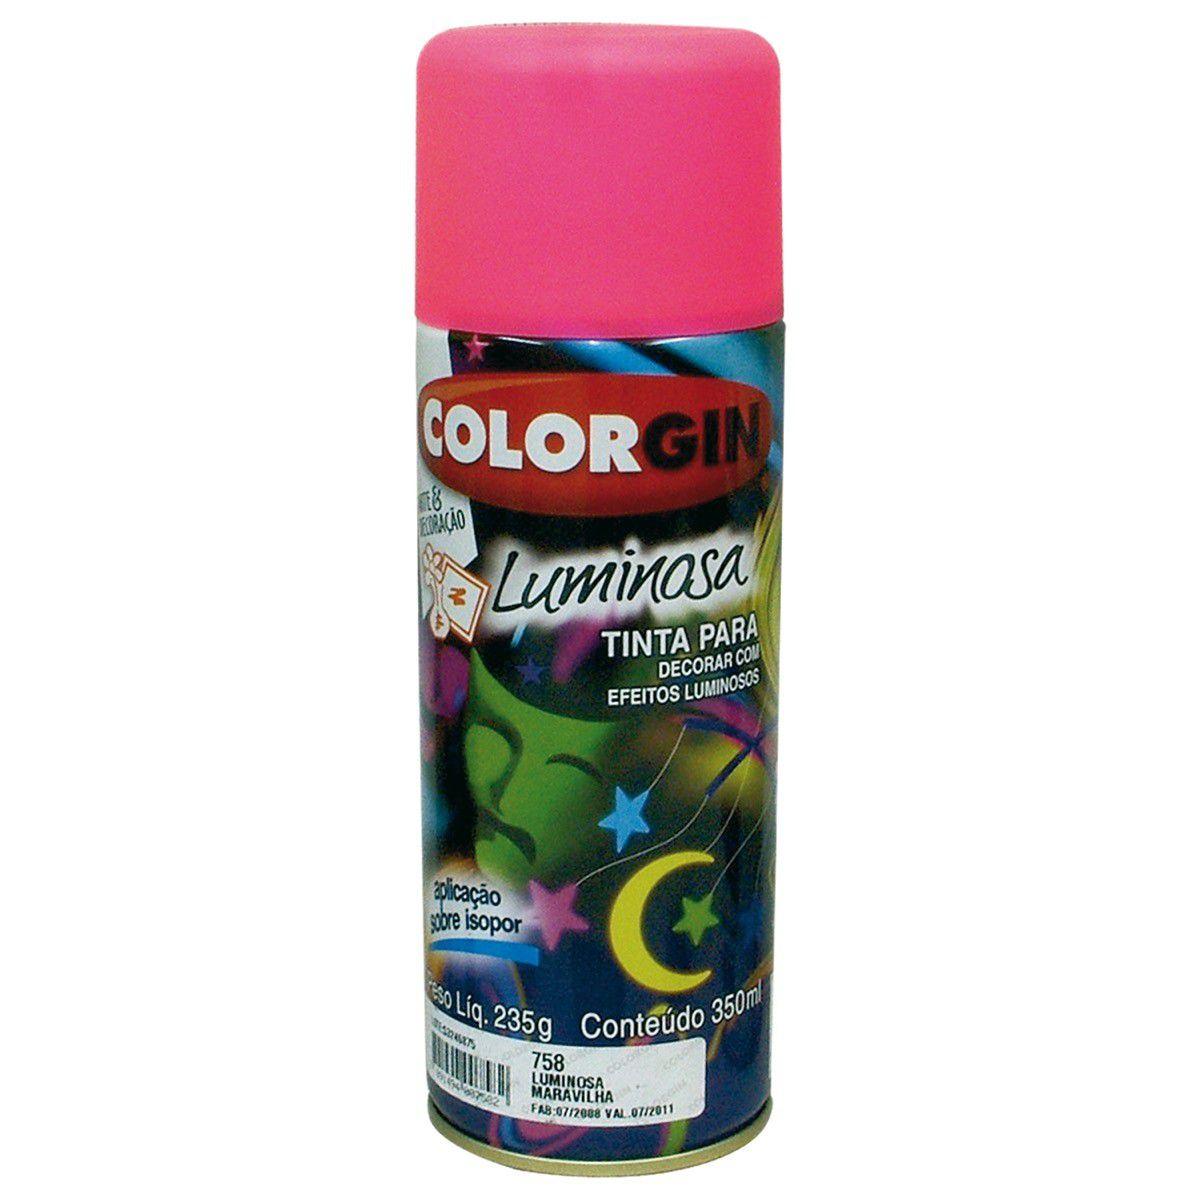 Tinta Spray Colorgin Luminosa Maravilha 350Ml #A